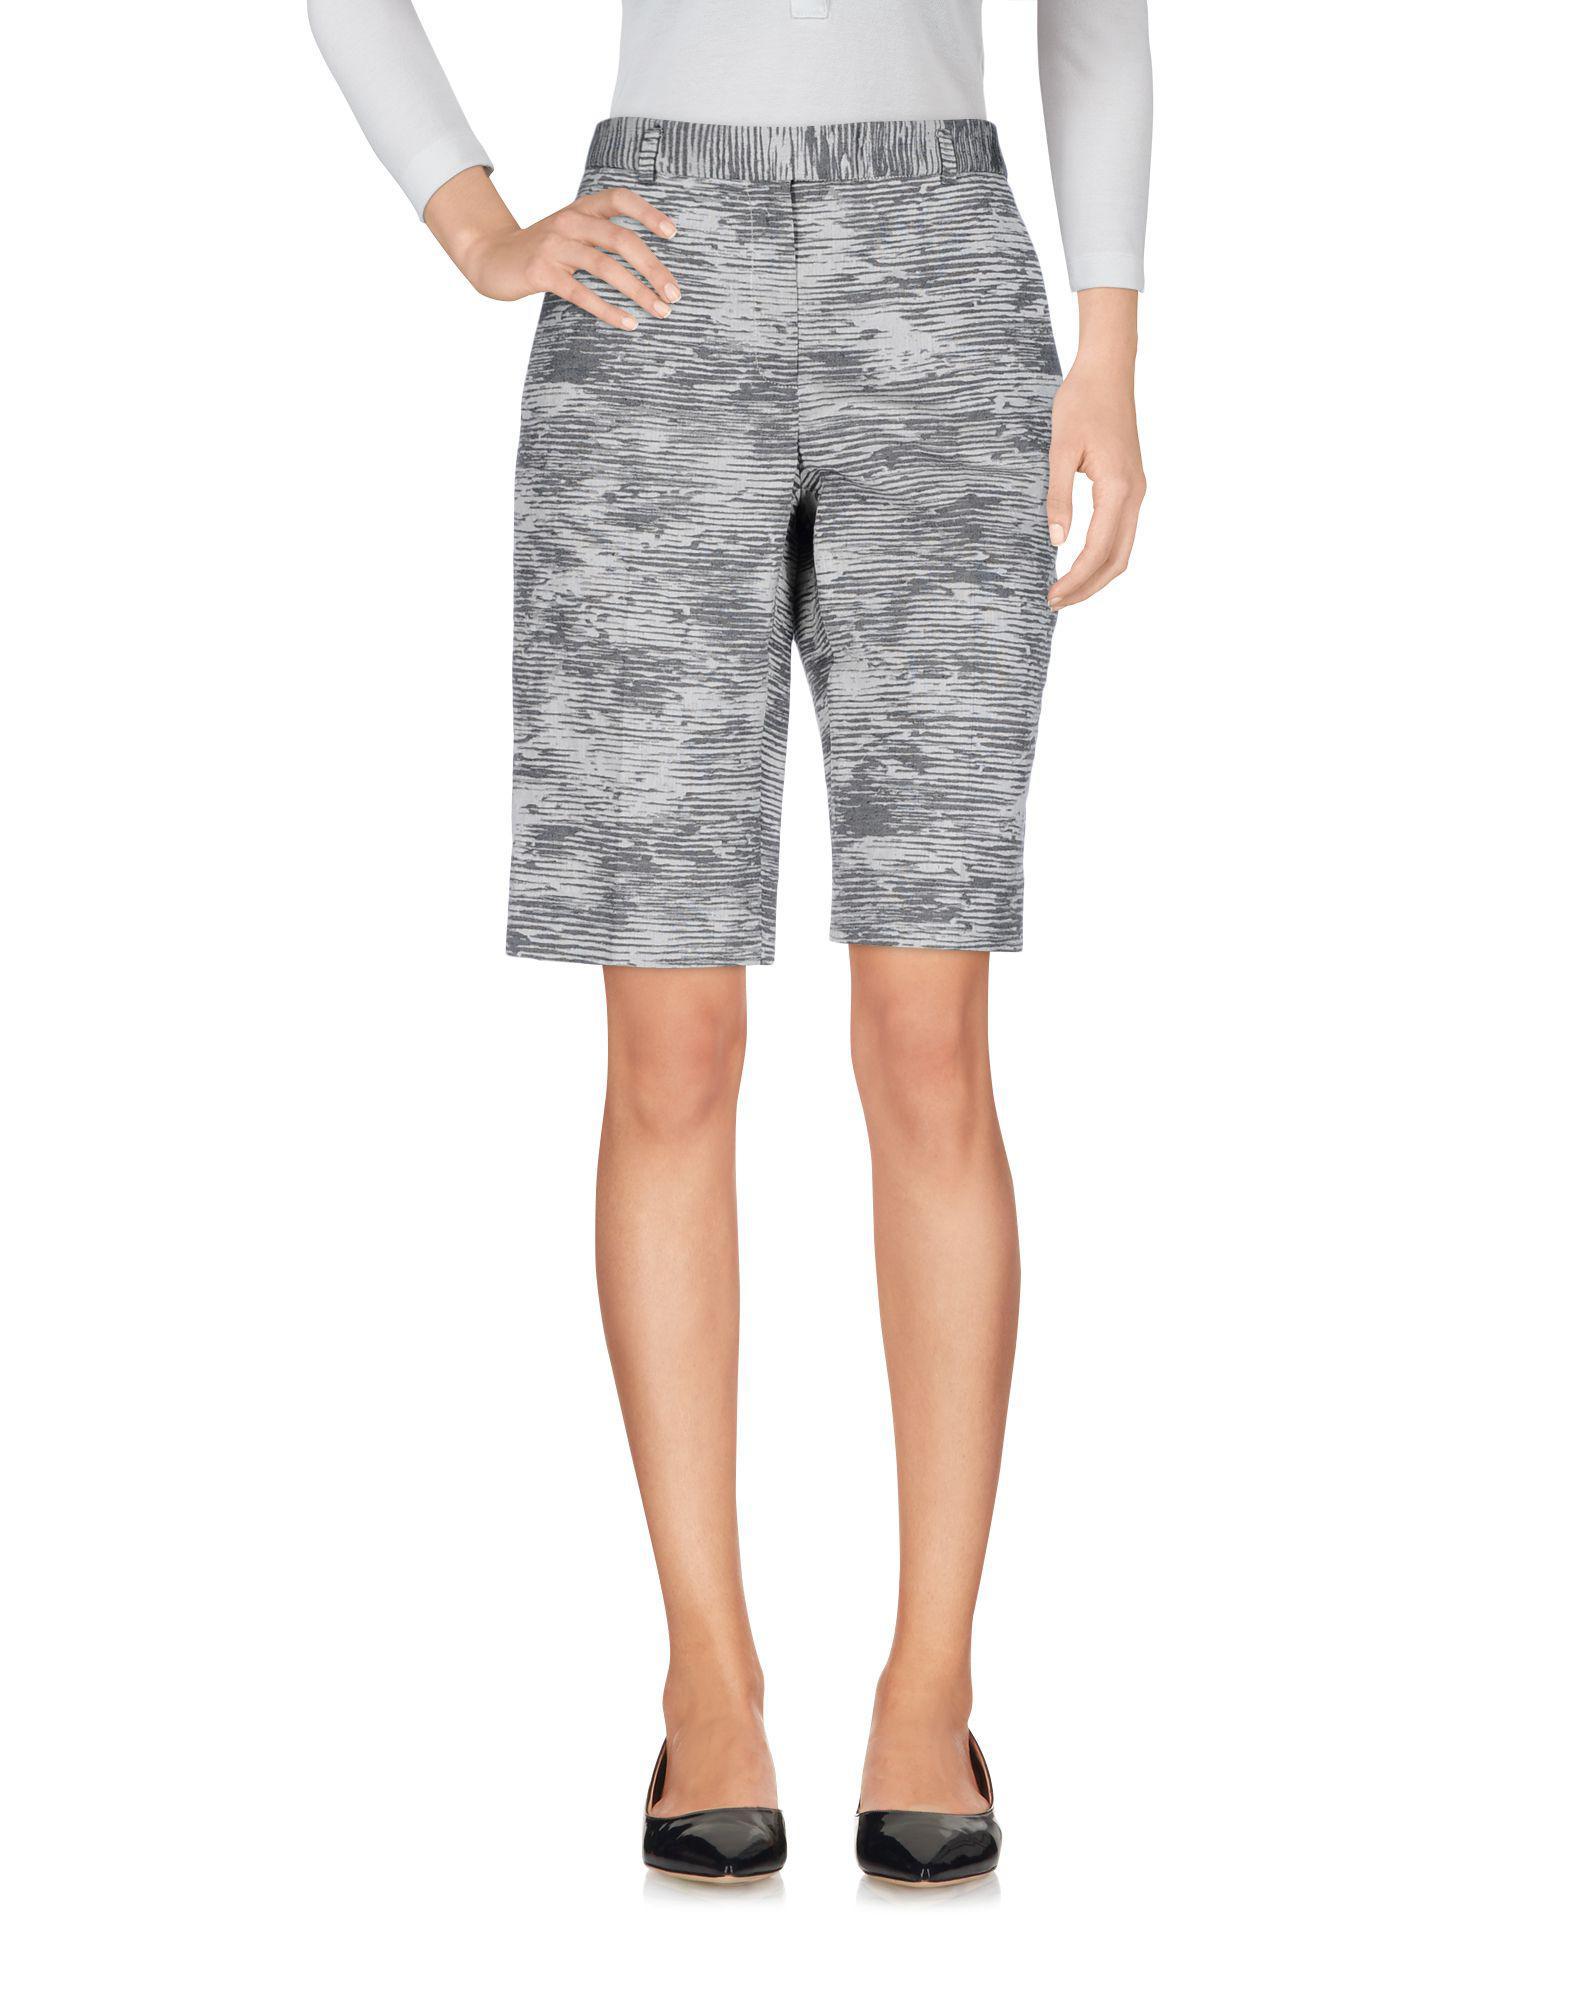 Shop Offer Online TROUSERS - Bermuda shorts Jason Wu Best Sale Online Buy Cheap Brand New Unisex Purchase Online Buy Cheap For Cheap g8C3KhOs